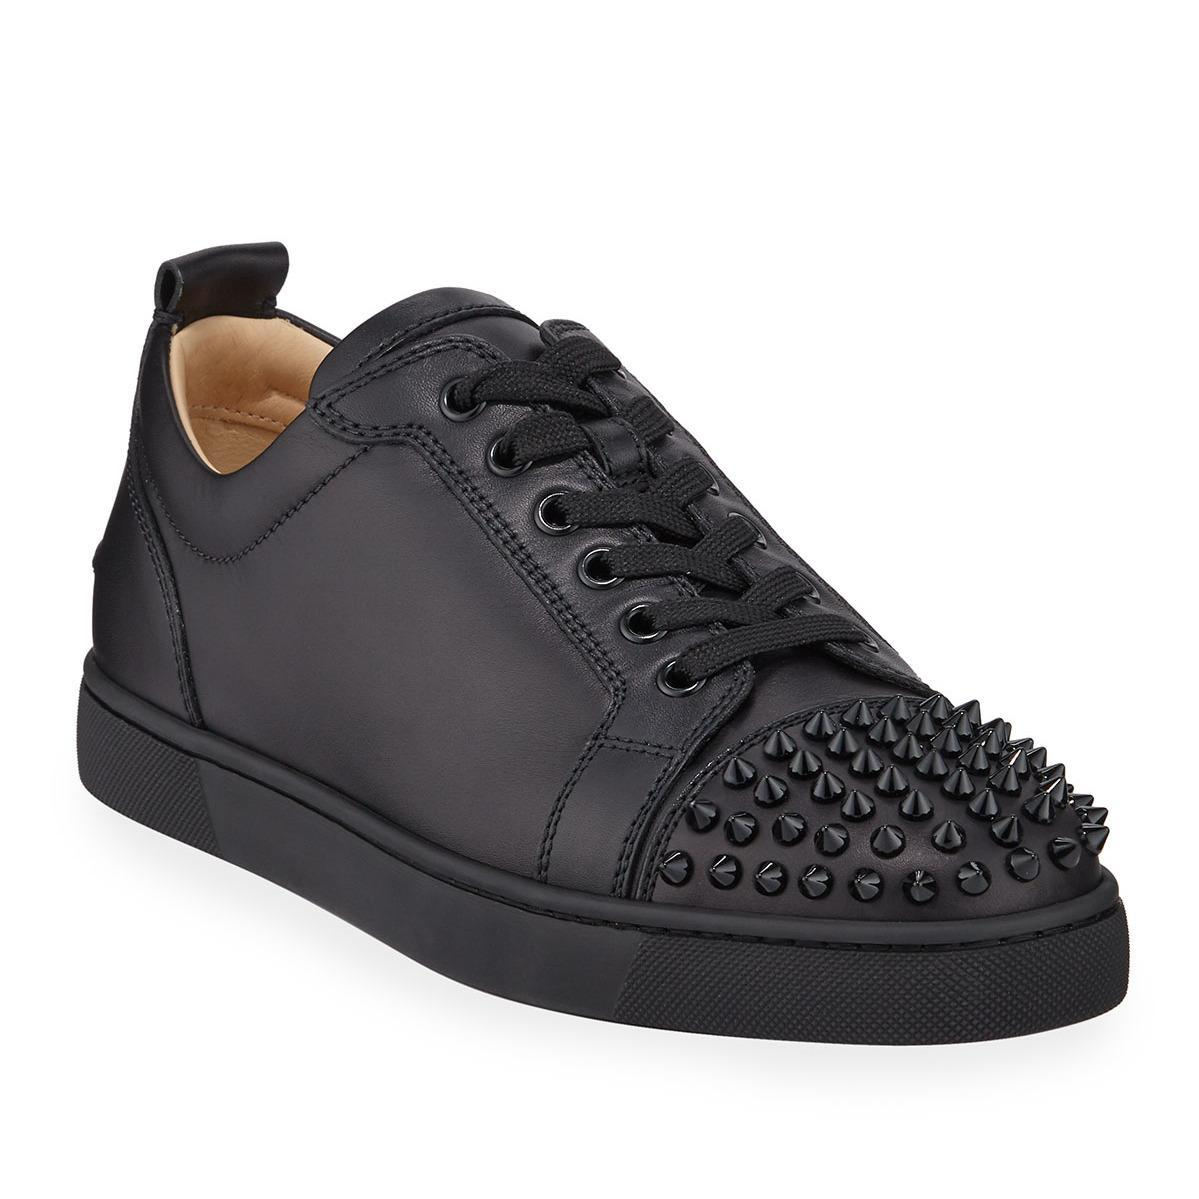 Designer Sneakers Red Top Bas Spikes Flats Chaussures Hommes Femmes en cuir suédé Sneakers Party Designer Shoes